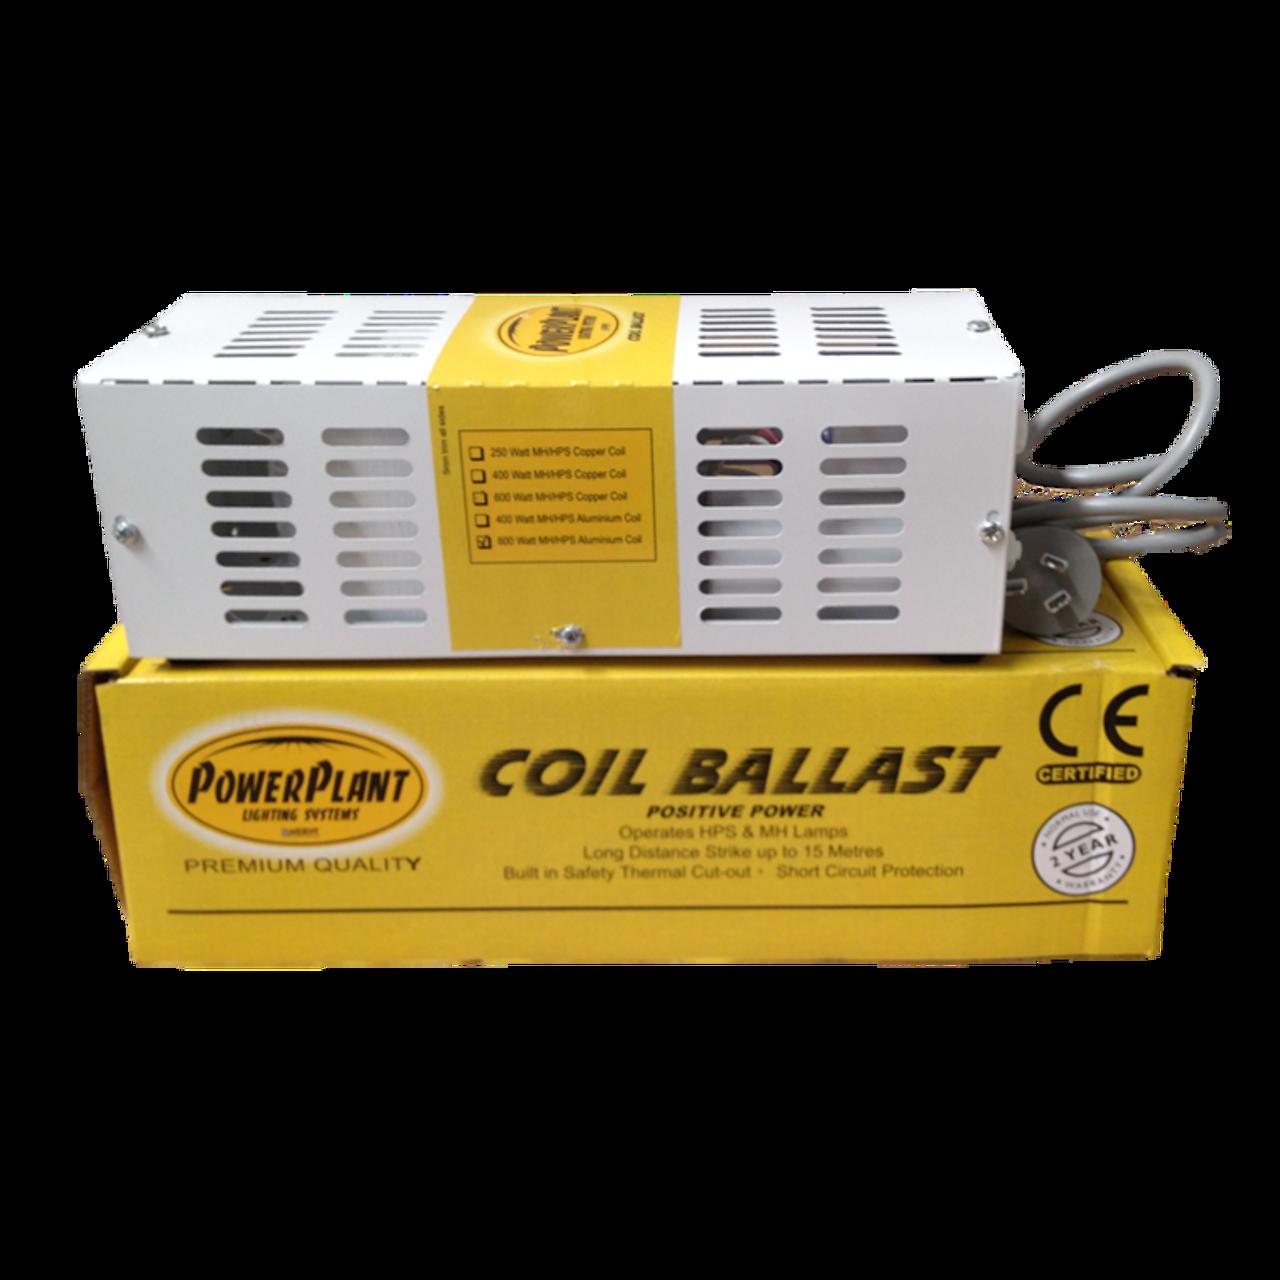 POWERPLANT 175 WATT MH COPPER COIL BALLAST (AUST)